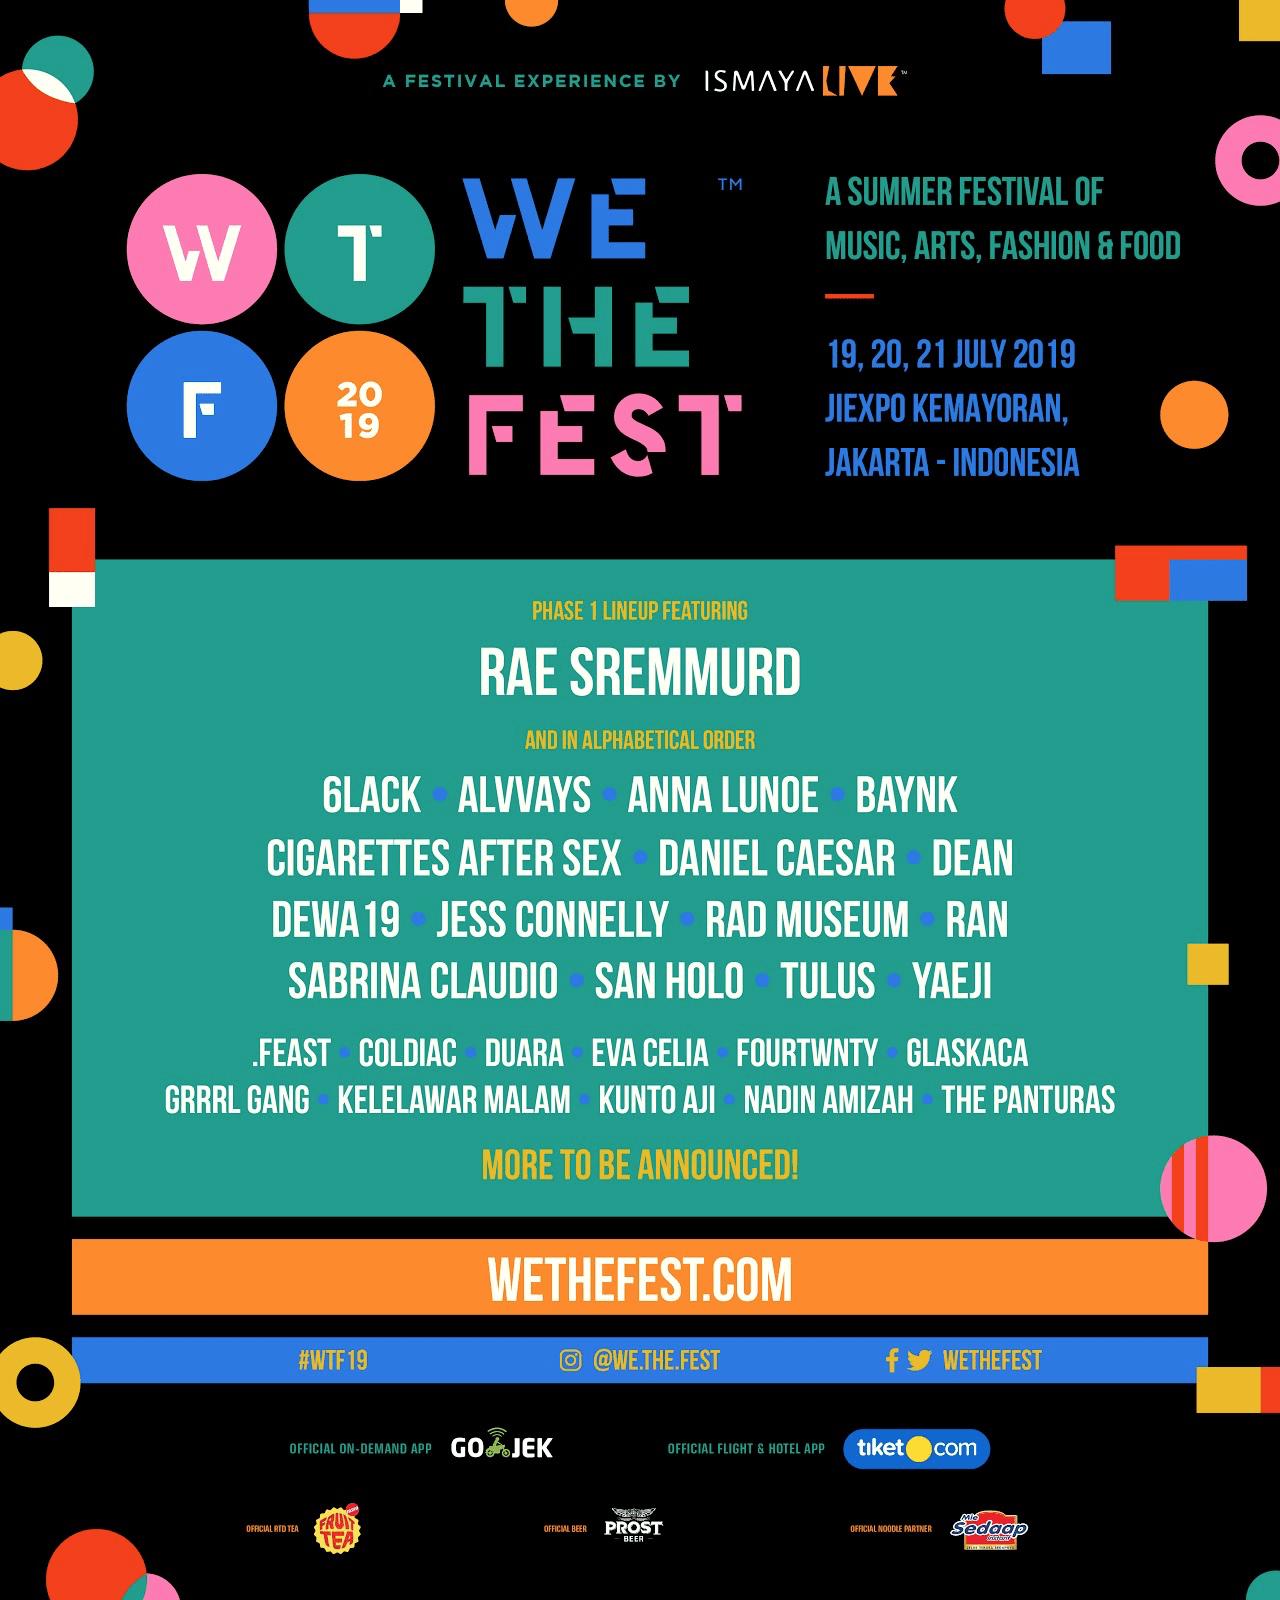 We The Fest 2019 Phase 1 lineup: 6LACK, Daniel Caesar, Yaeji